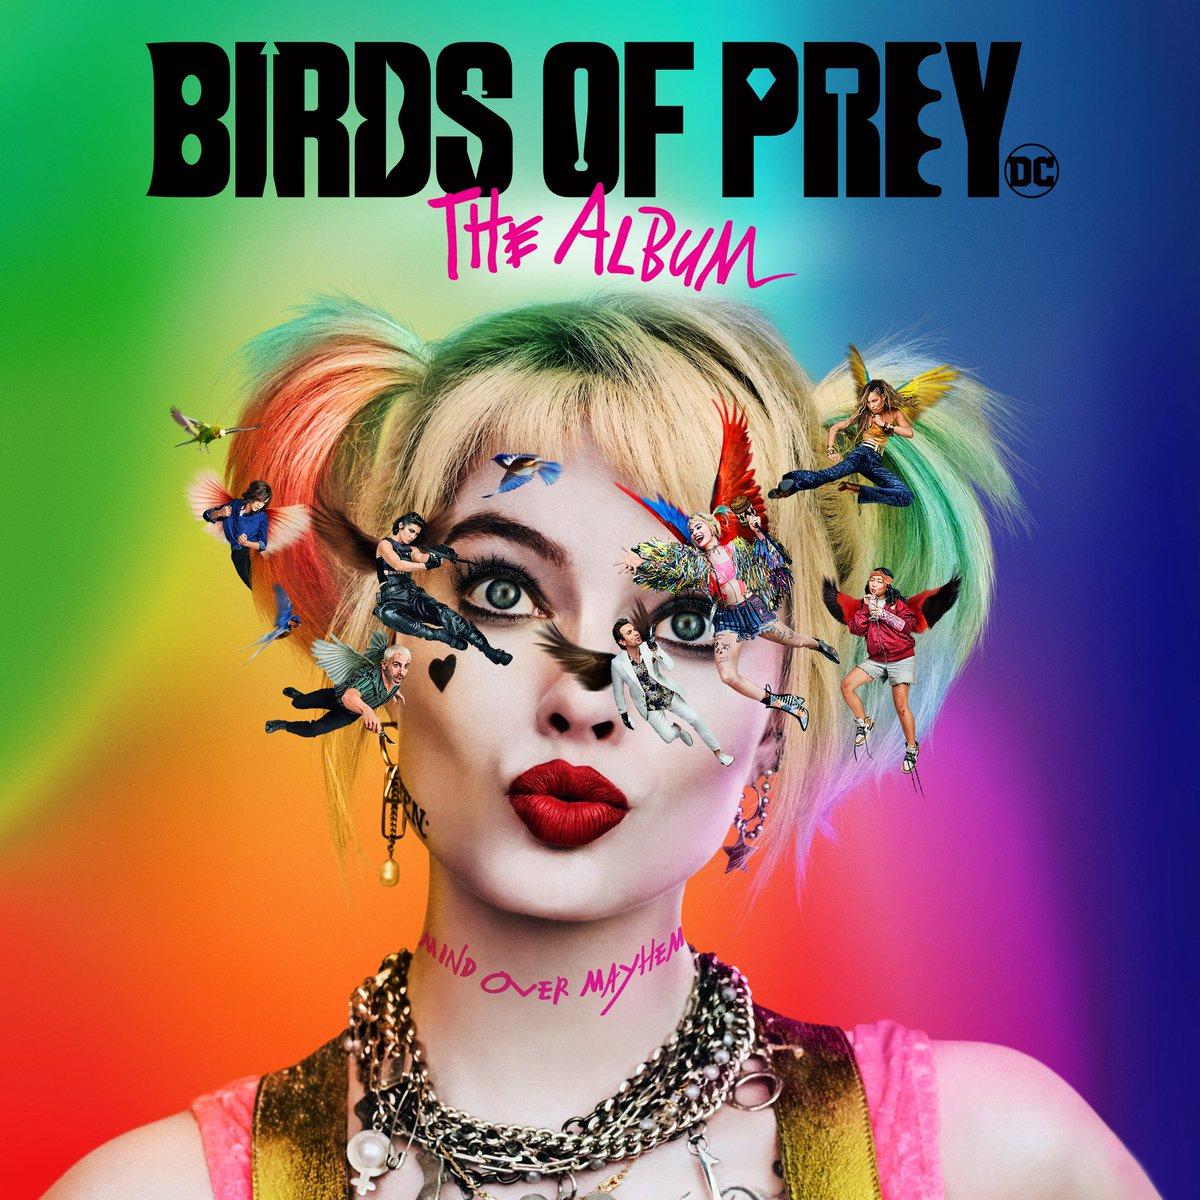 LET'S 👏 FREAKIN' 👏 DO 👏 THIS! 👏 #BirdsOfPrey @DojaCat @Normani @theestallion @halsey @IAMSUMMERWALKER @Saweetie @LaurenJauregui @kflay @charlottelawr @maisiehpeters @WHIPPEDCREAM @babygothxx @GALXARA @cynthialovely @iamjuceefroot @sofitukker @ADONA_music @jurneesmollett